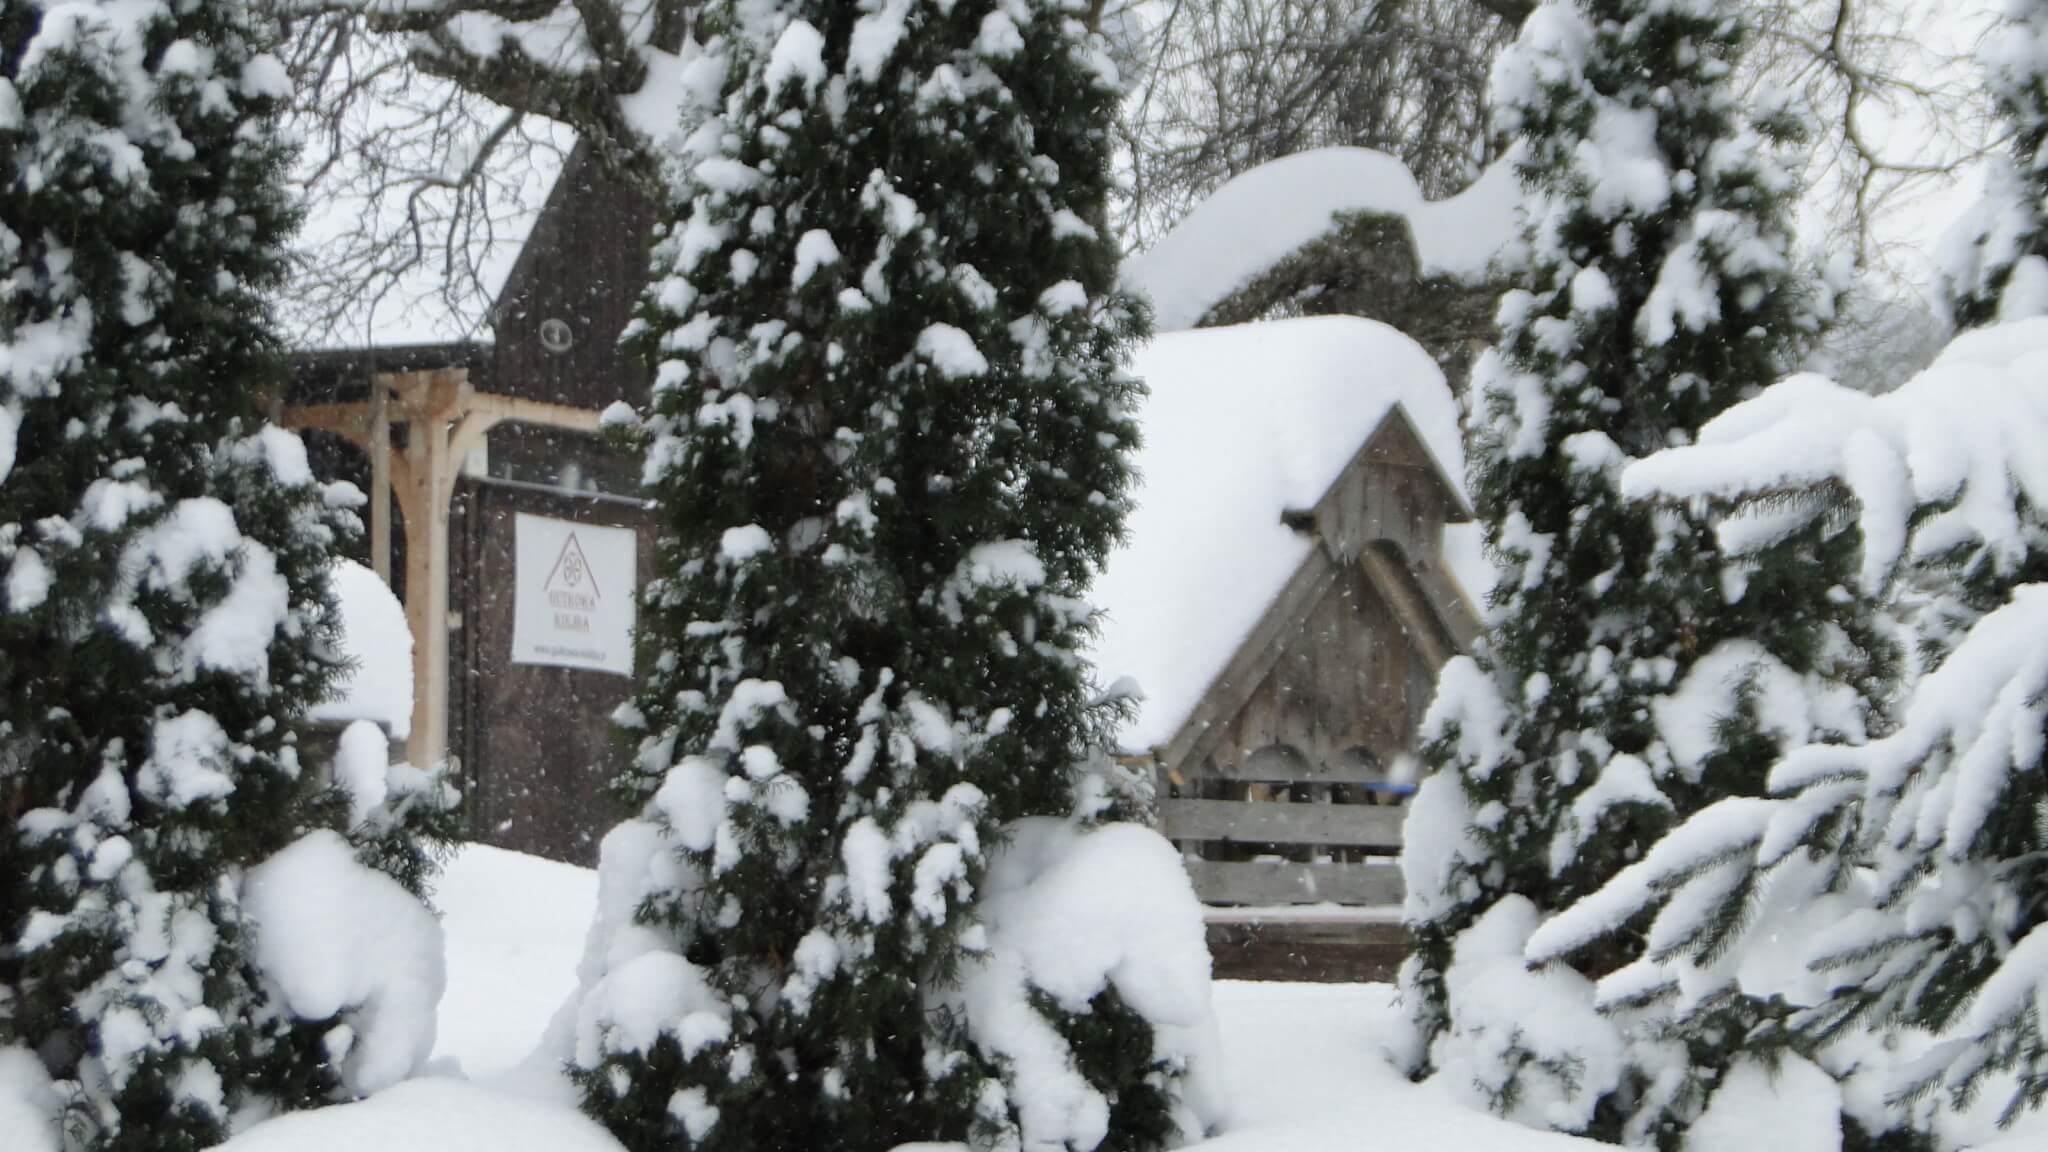 Śnieg,  śnieg, śnieg!... 6